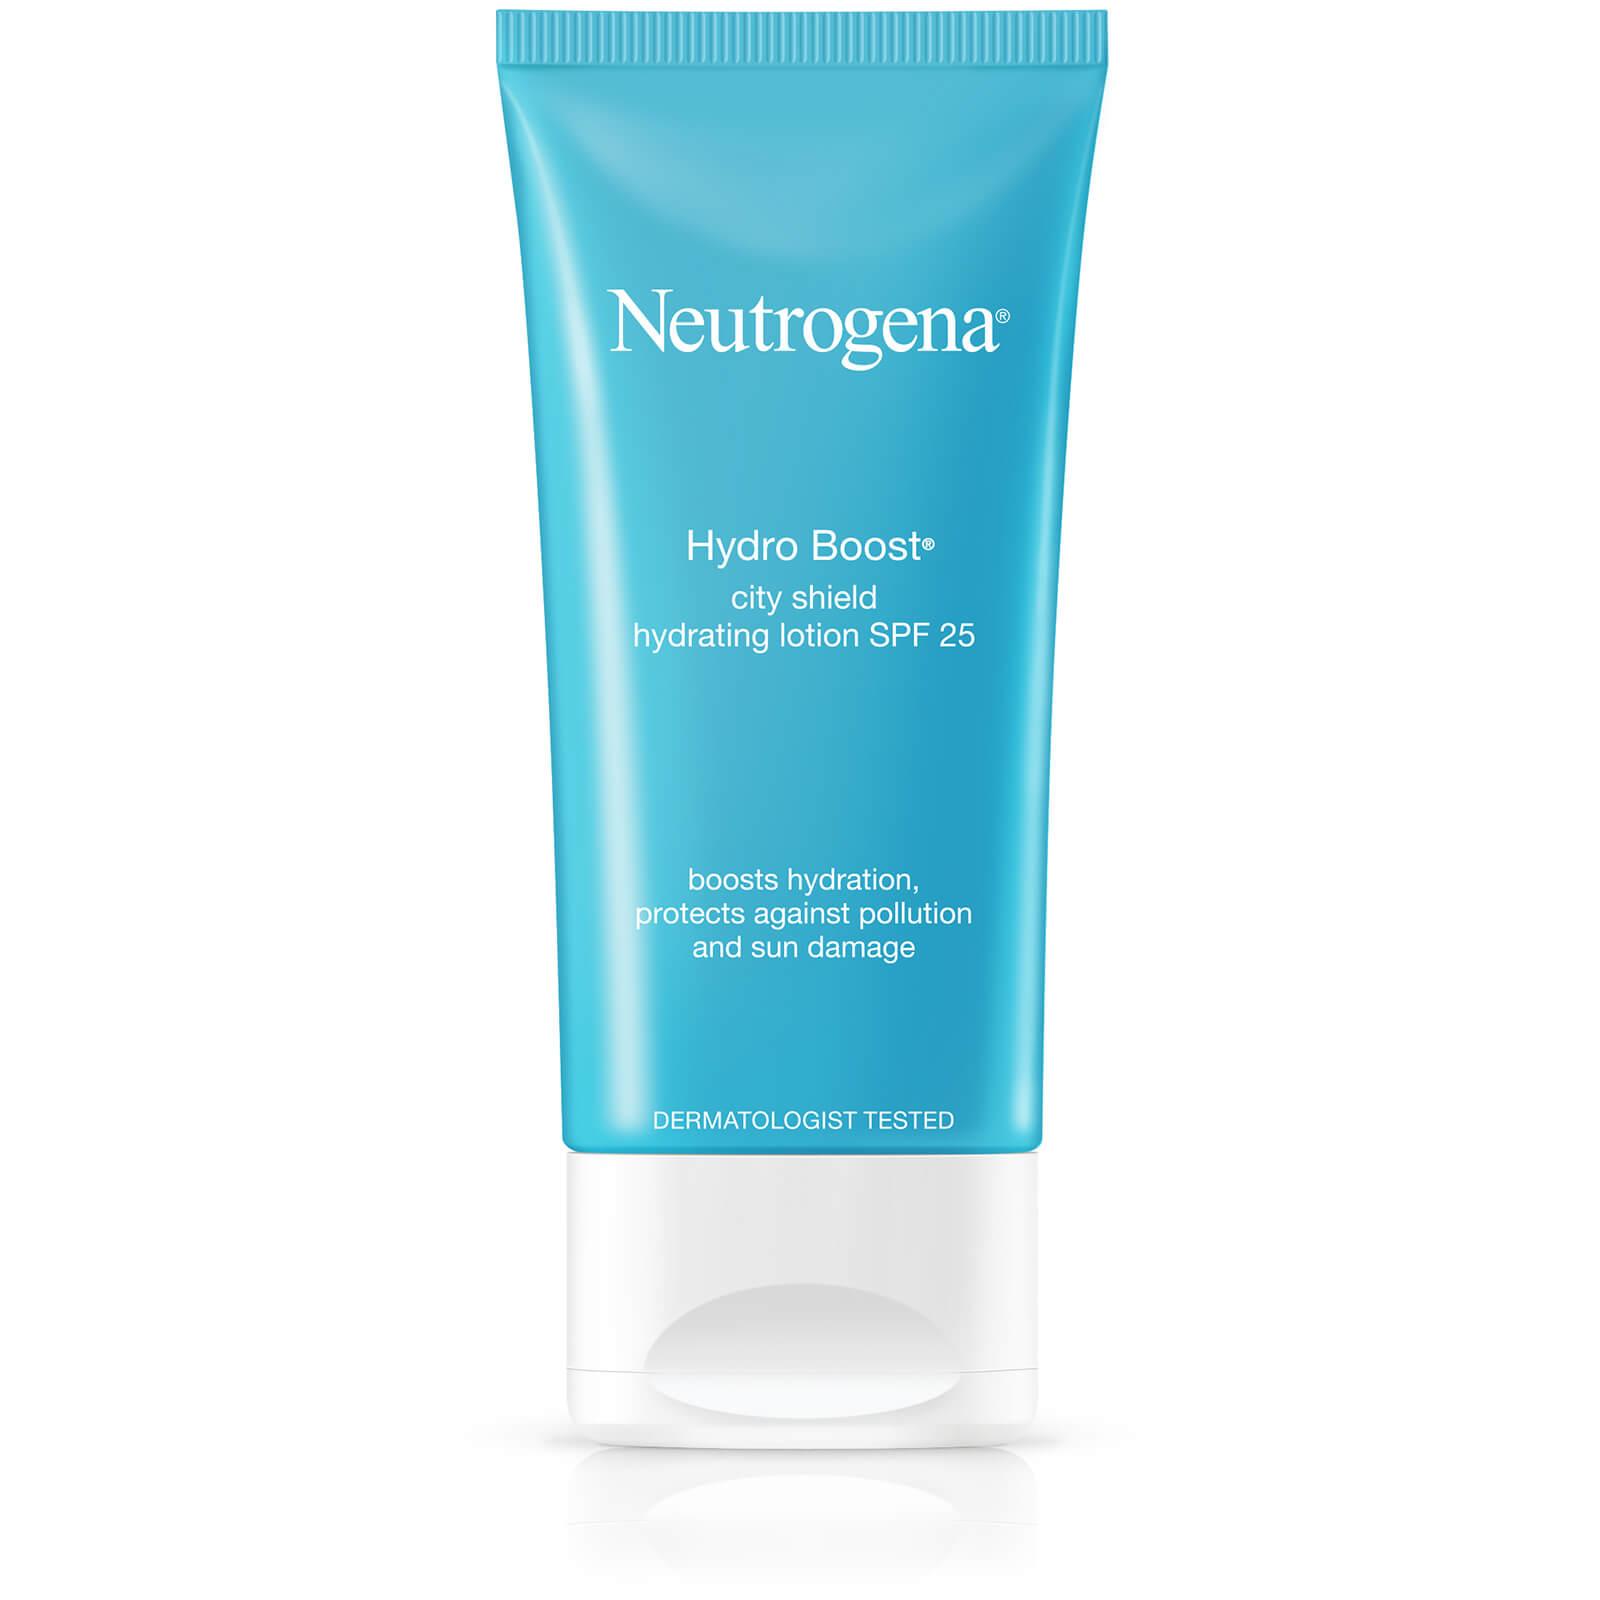 Hidratante Hydro Boost de Neutrogena